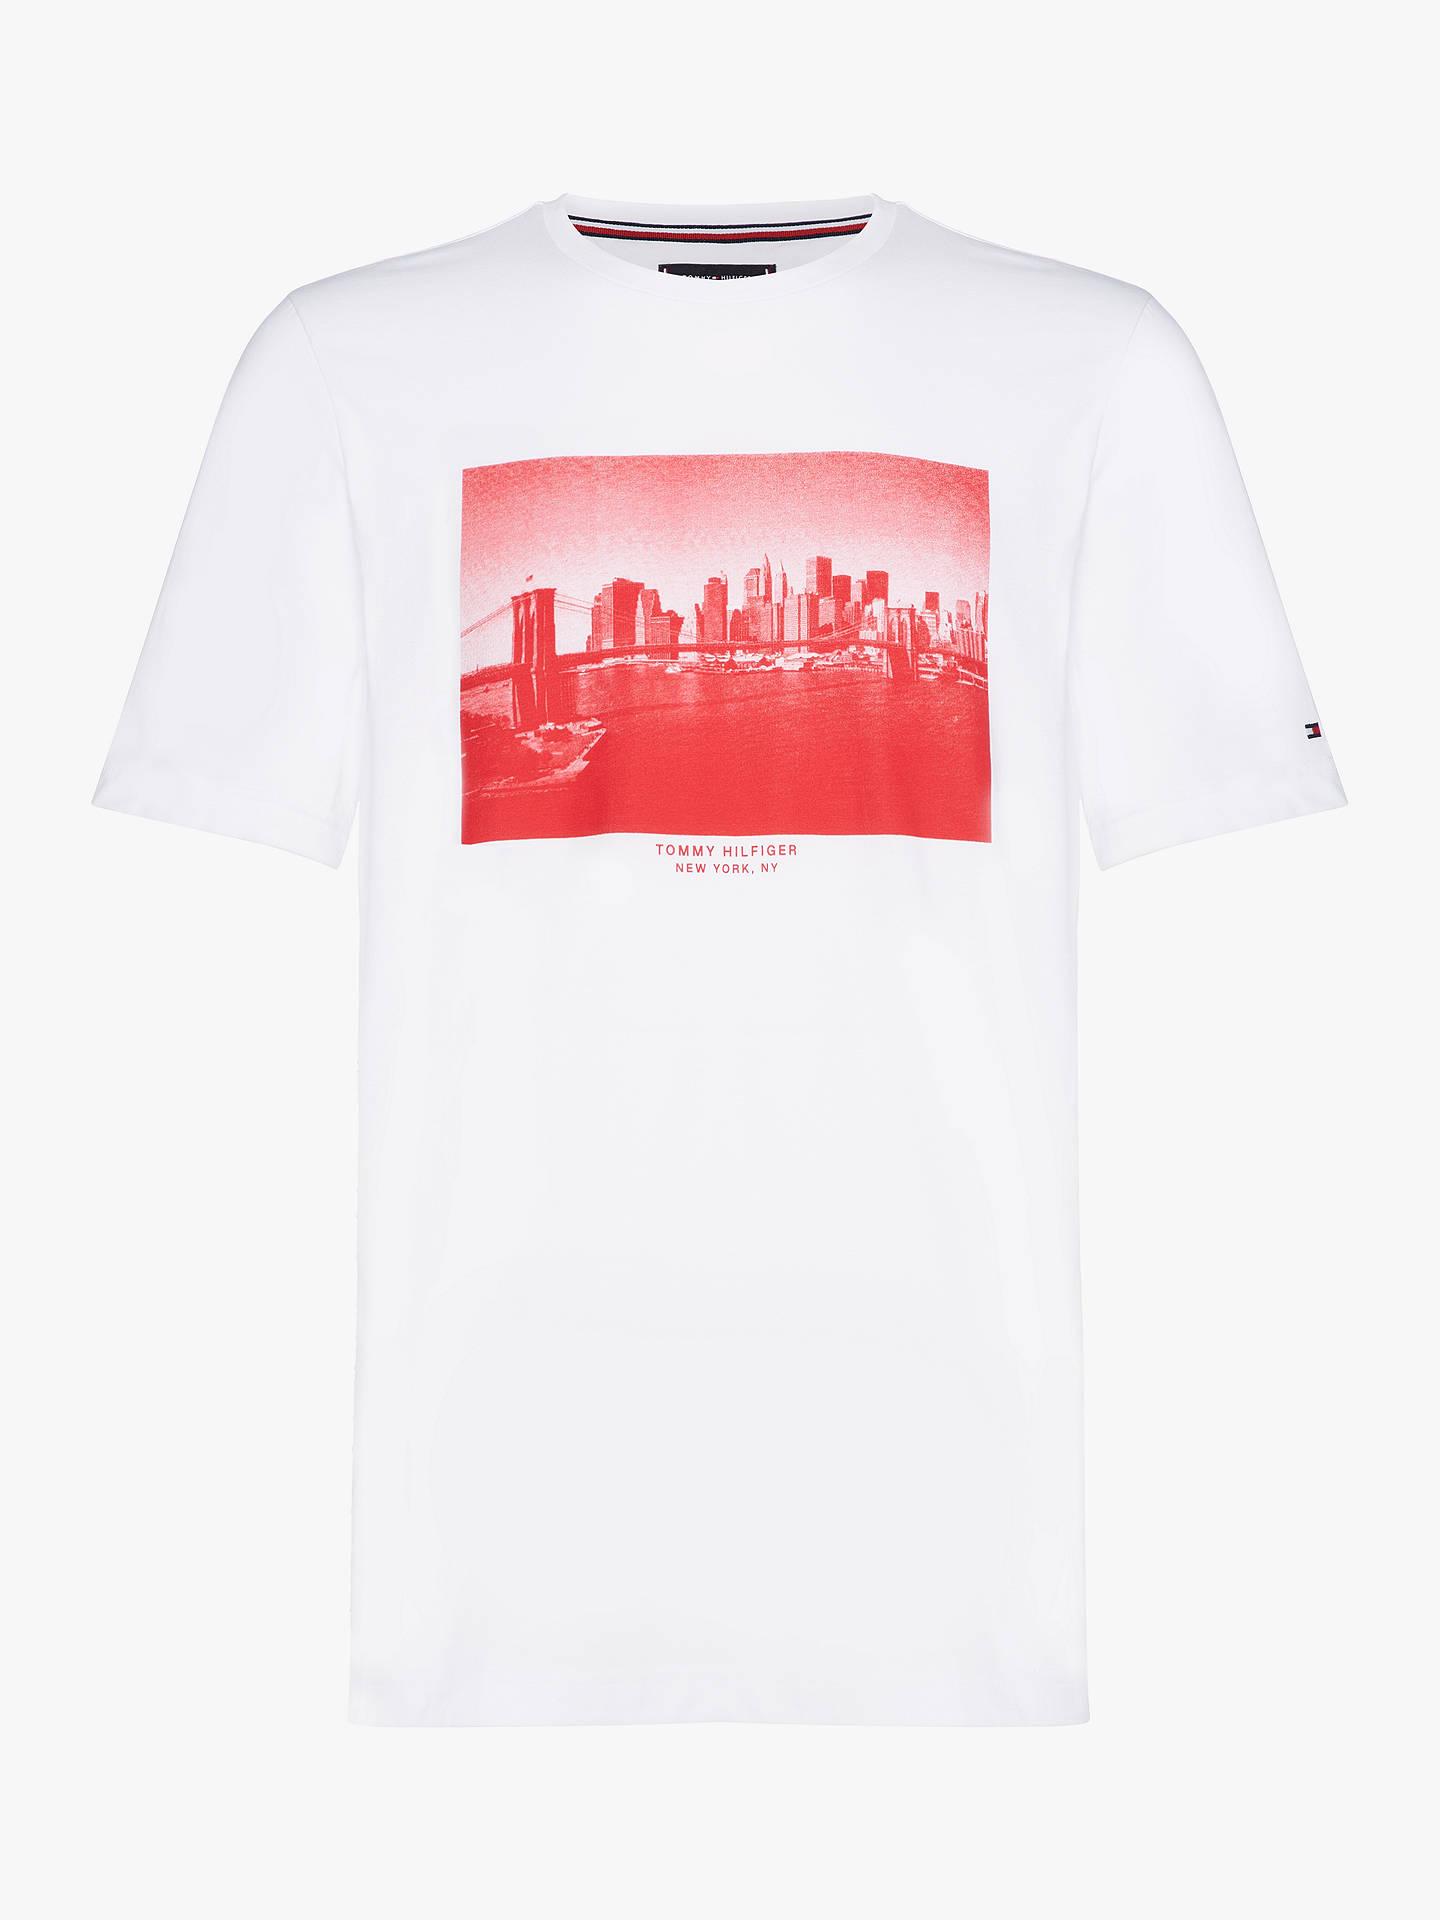 992f51331 Buy Tommy Hilfiger Skyline Photo Print Short Sleeve T-Shirt